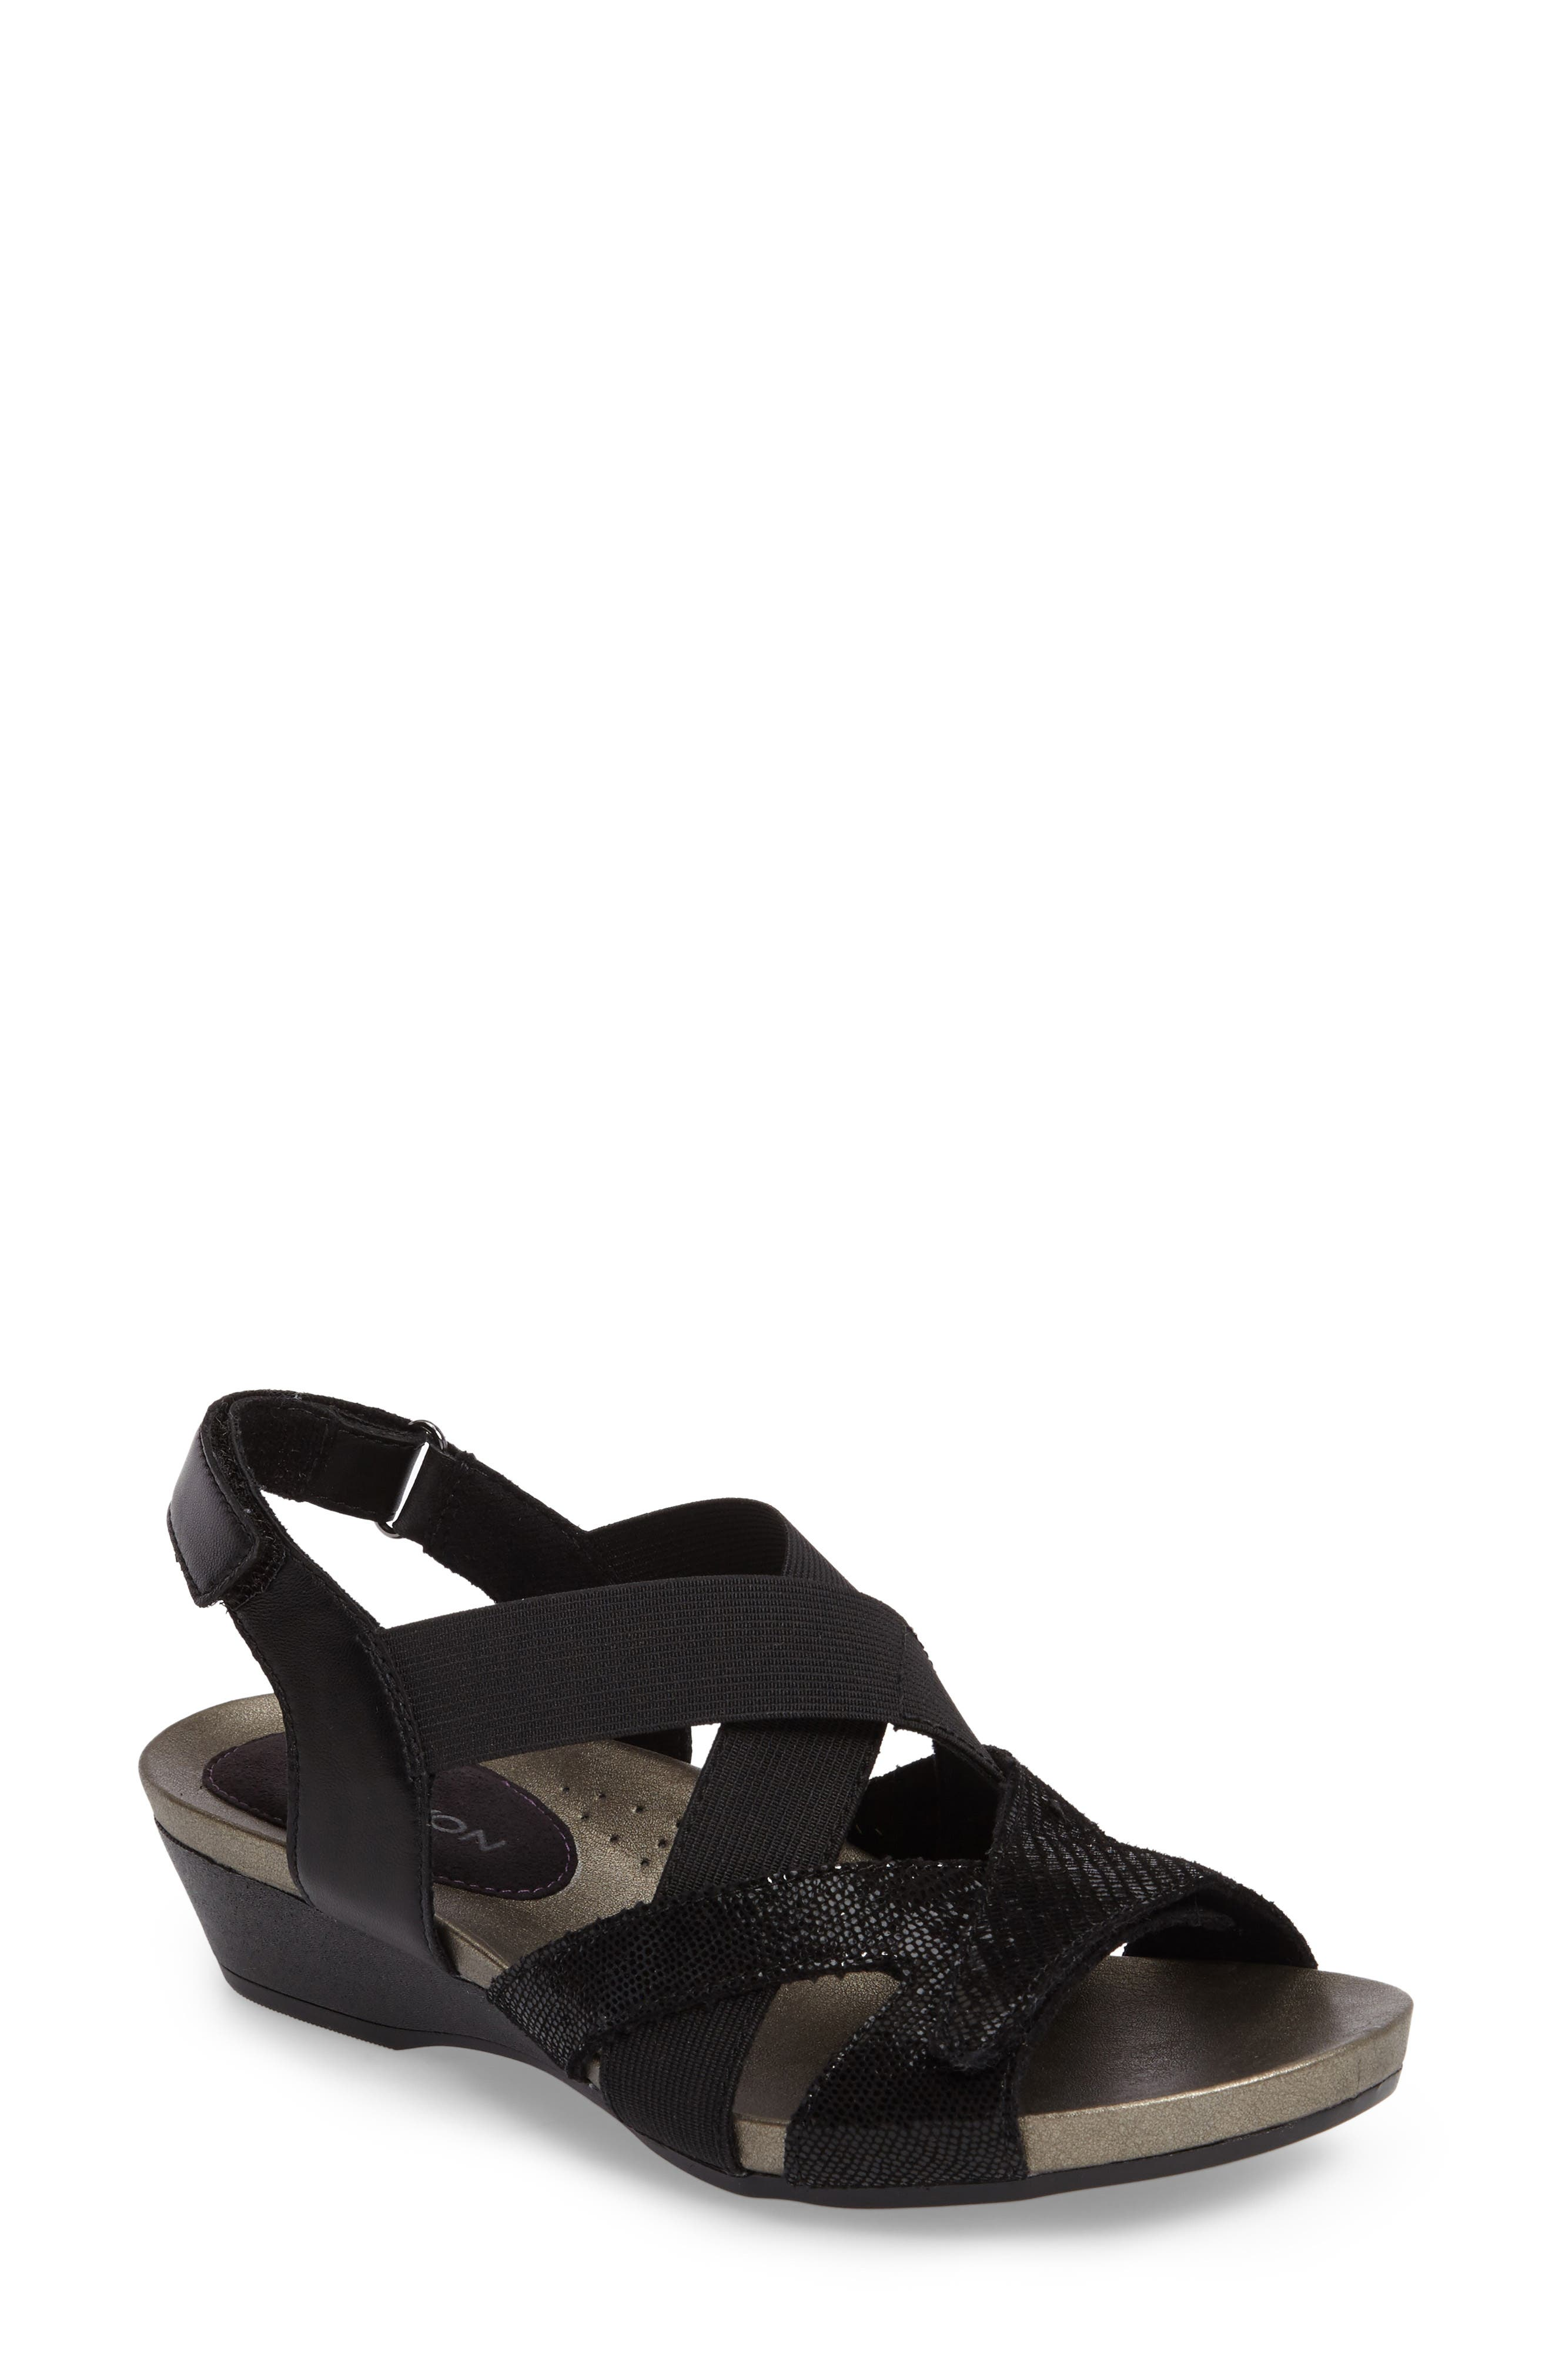 Standon Cross Strap Sandal,                         Main,                         color, 001